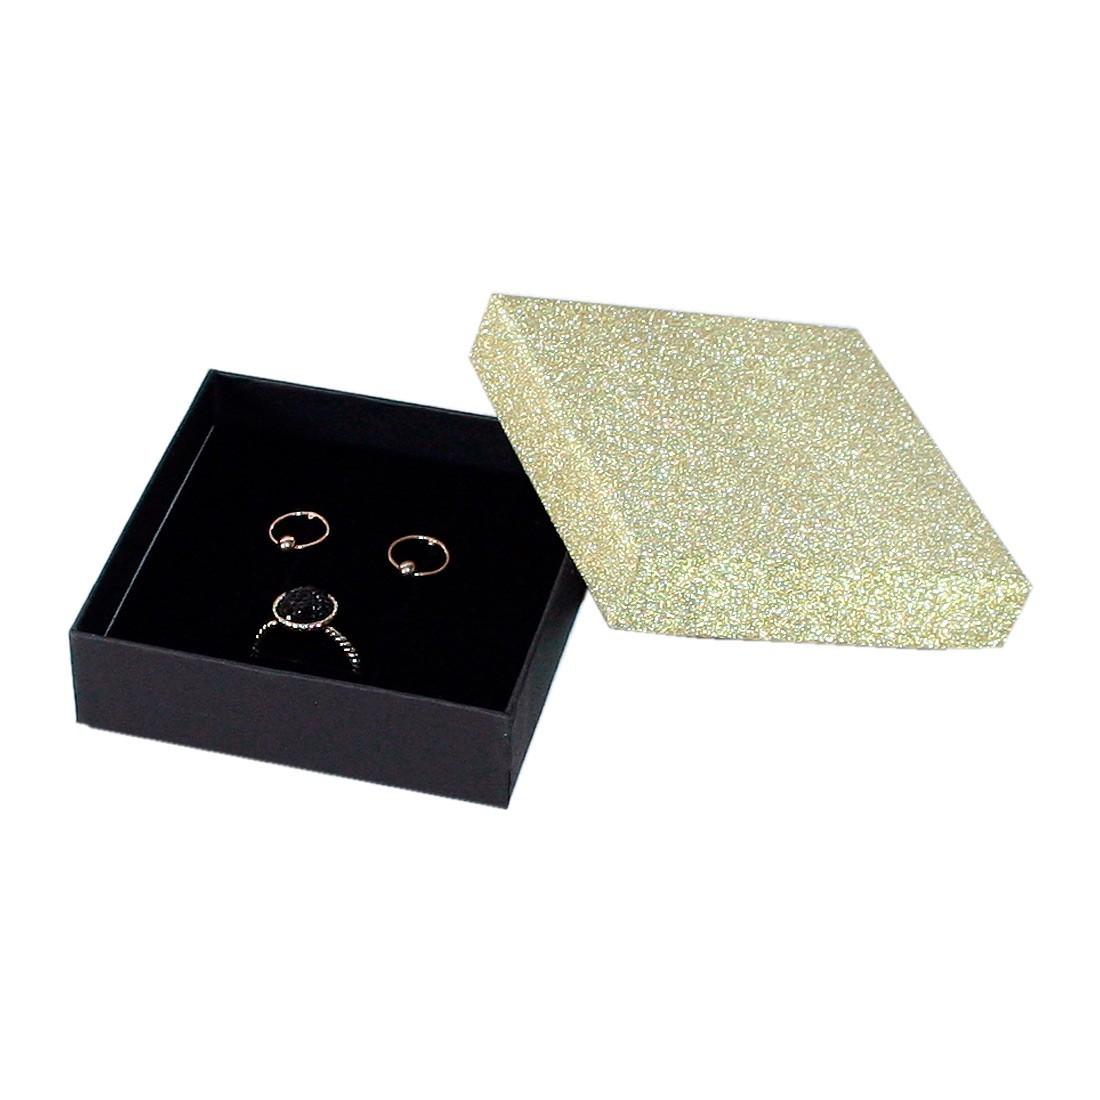 Glitter cardboard jewellery box for earrings and ring, Compack